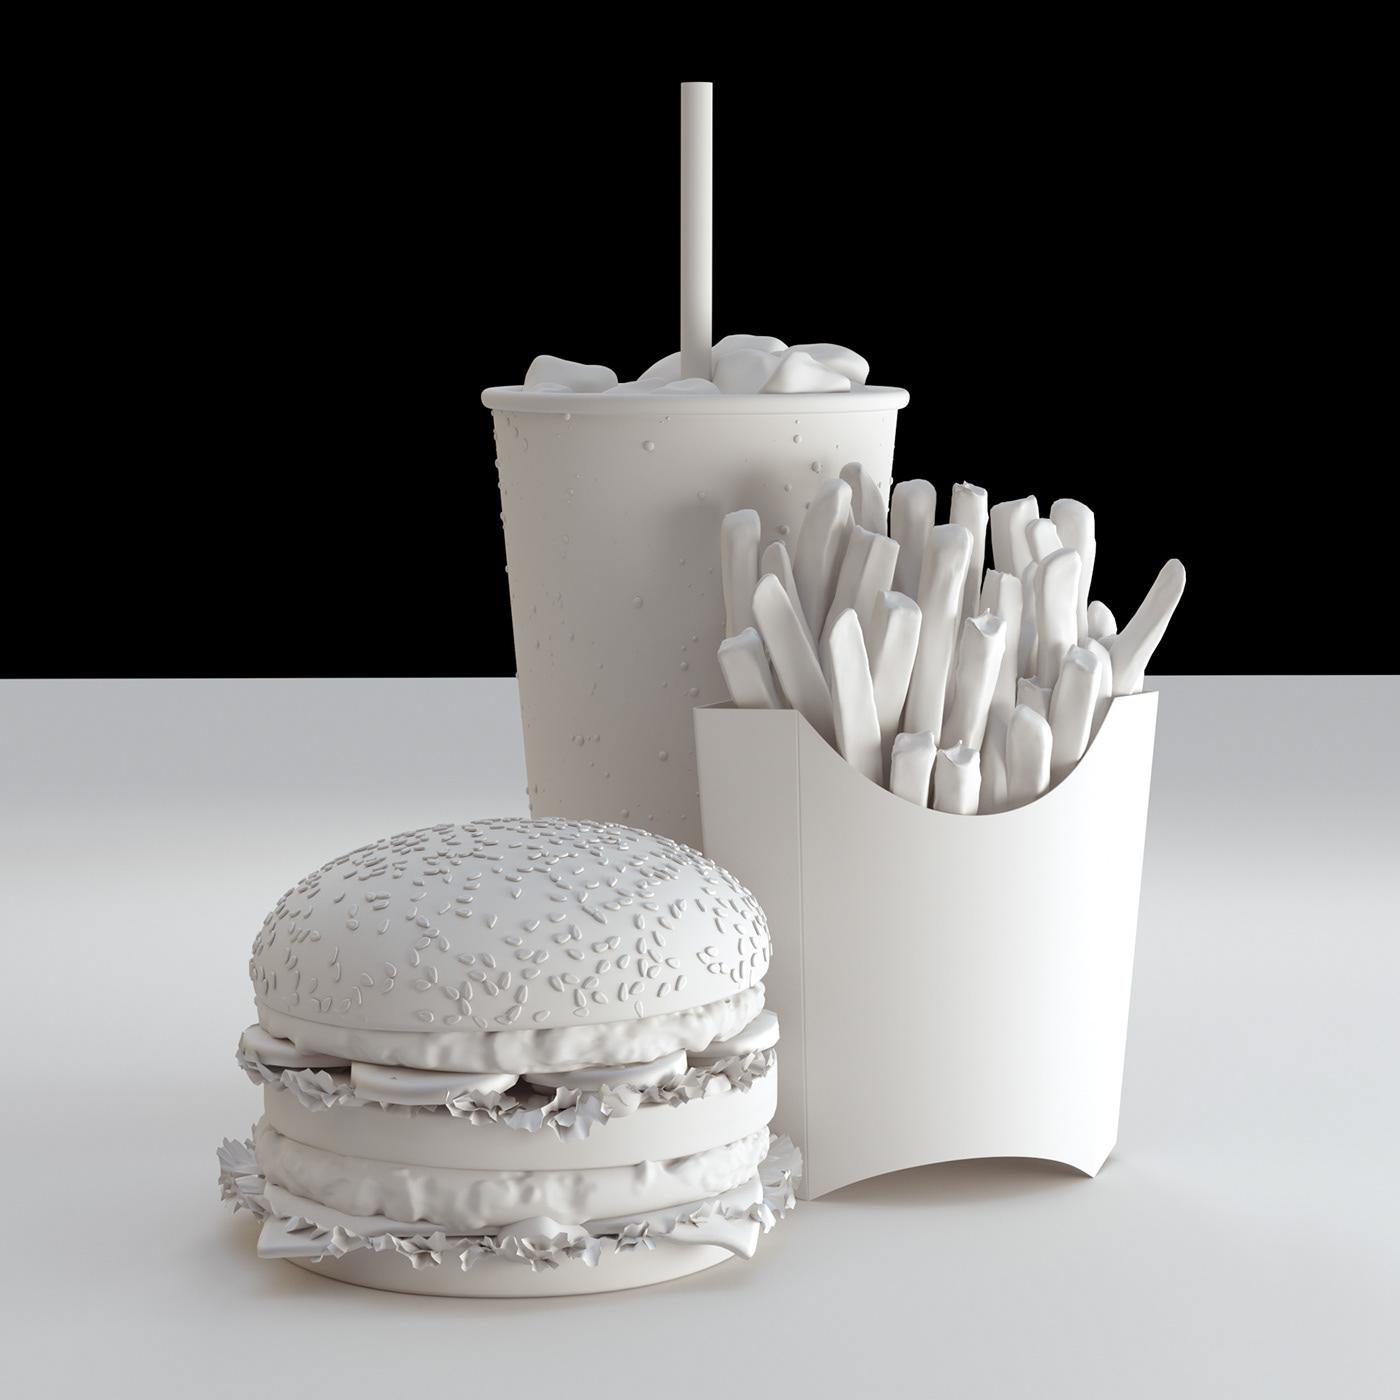 McDonalds bigmac burger 3D CG postproduction retouching  Render